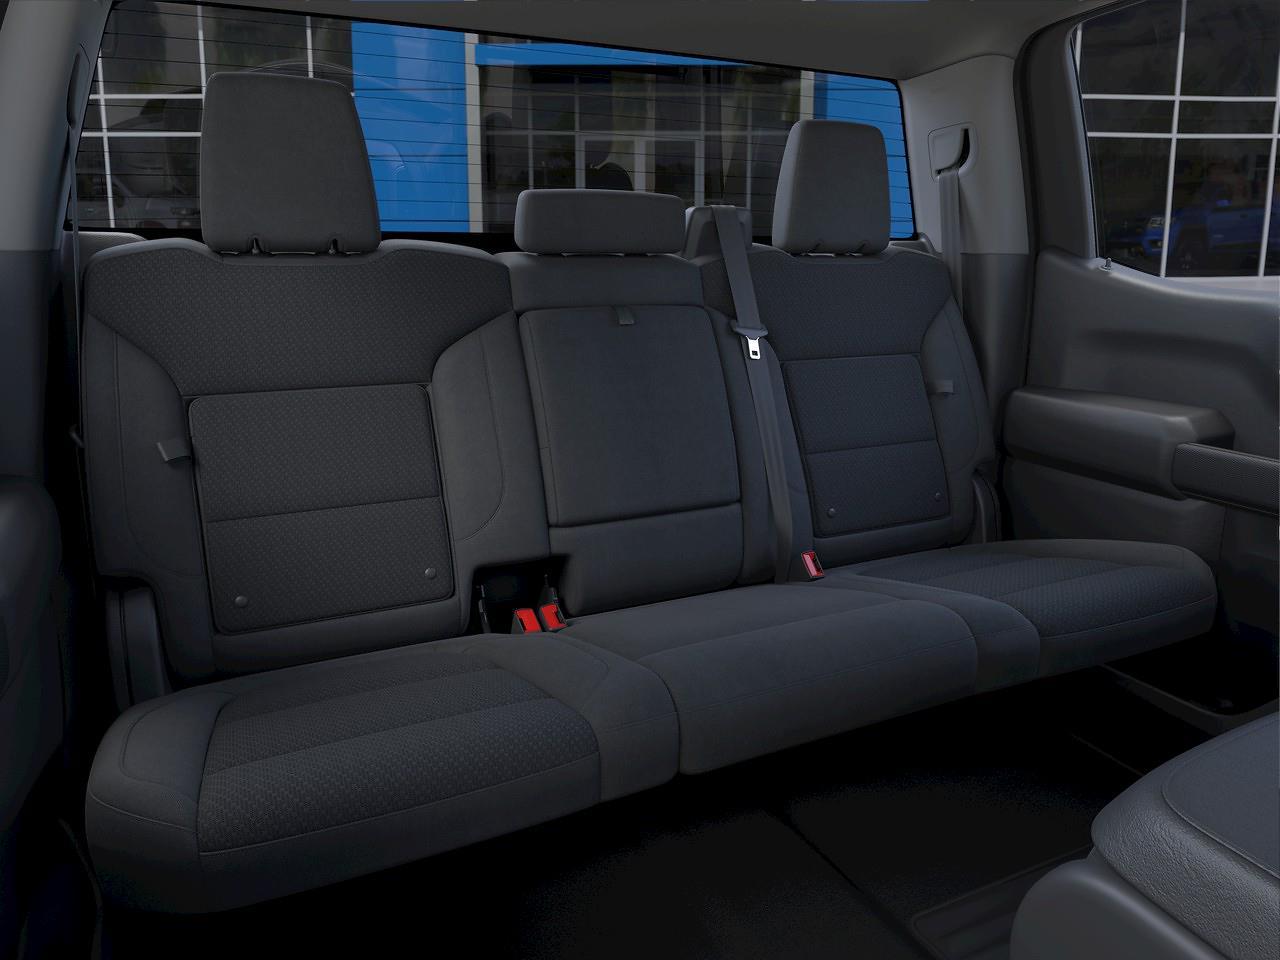 2021 Chevrolet Silverado 1500 Crew Cab 4x4, Pickup #Q210467 - photo 14